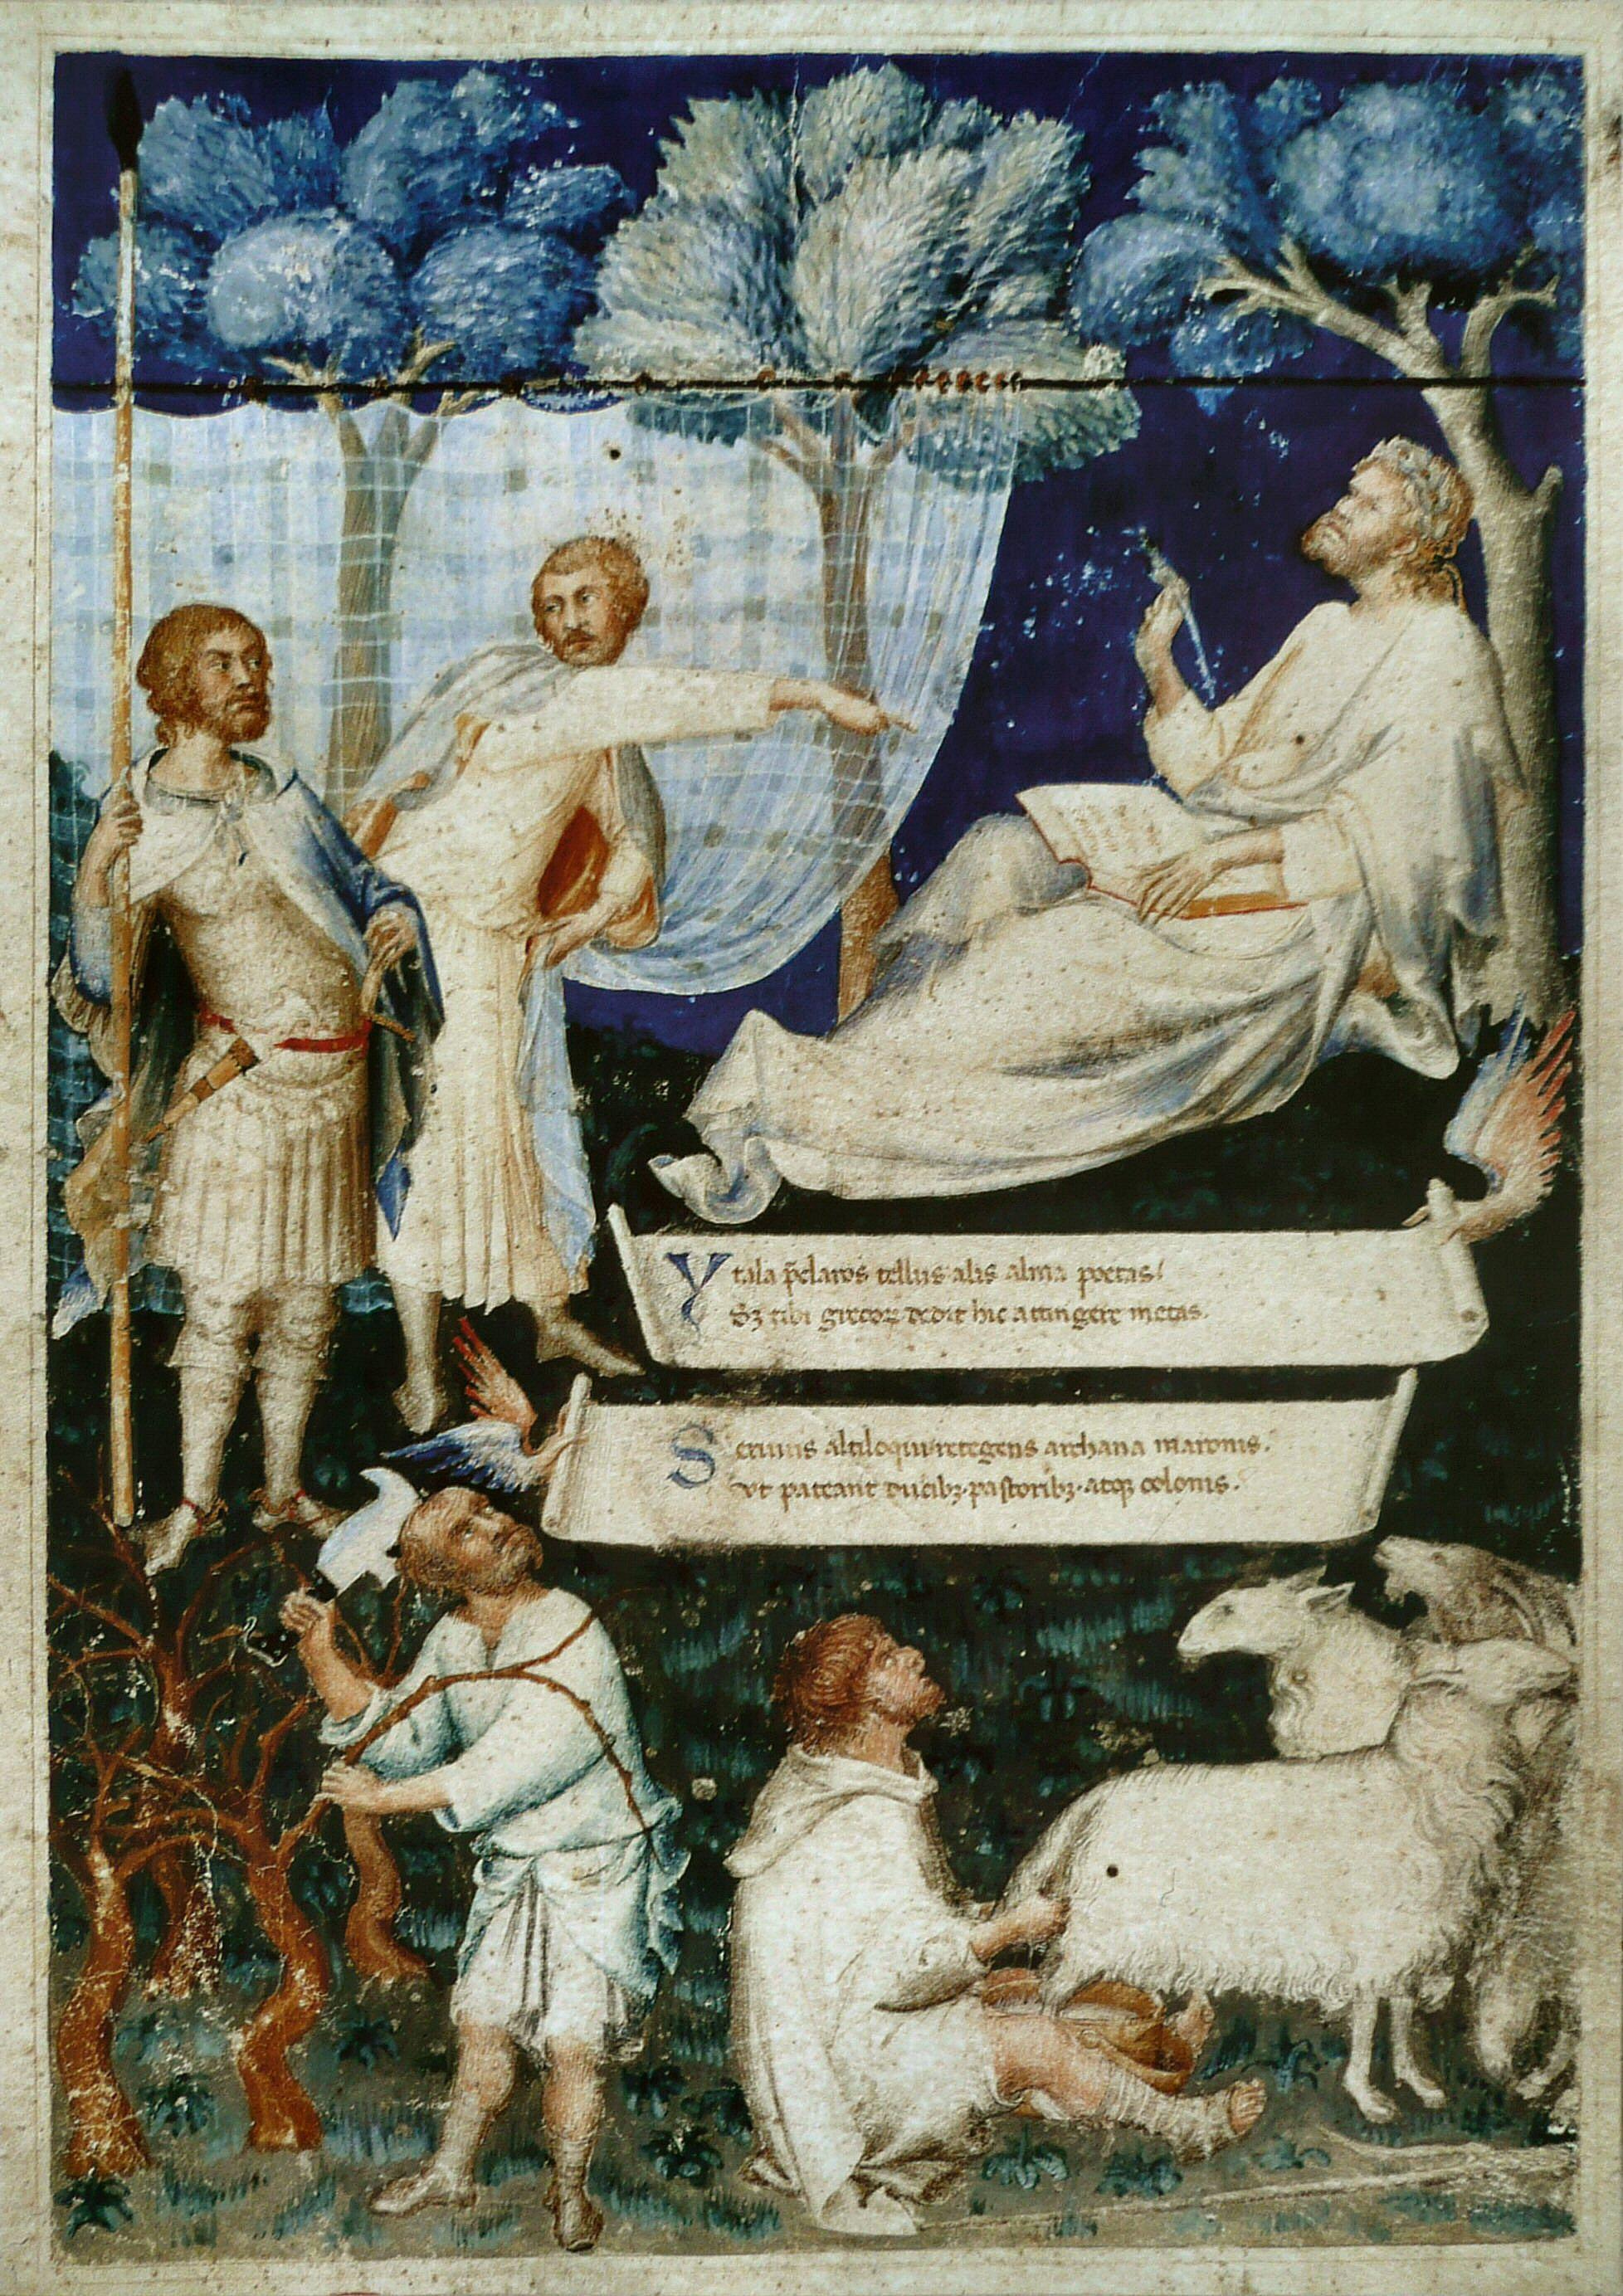 Simone Martini. Illustration by Virgil, XIV century.